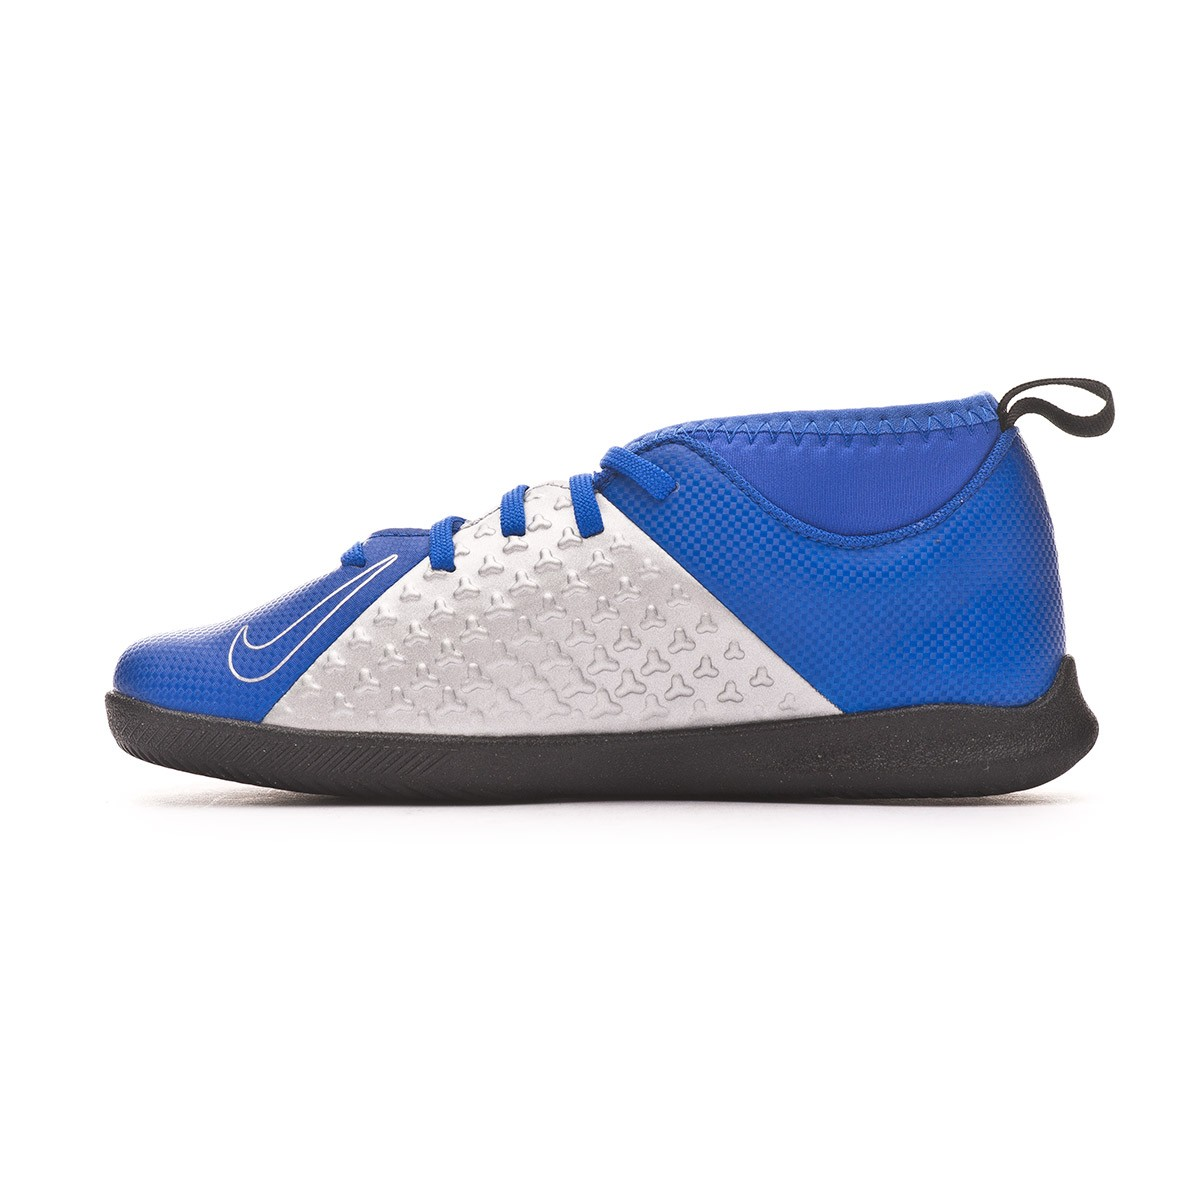 b45d8cce145 Futsal Boot Nike Kids Phantom Vision Club DF IC Racer blue-Black-Metallic  silver-Volt - Leaked soccer